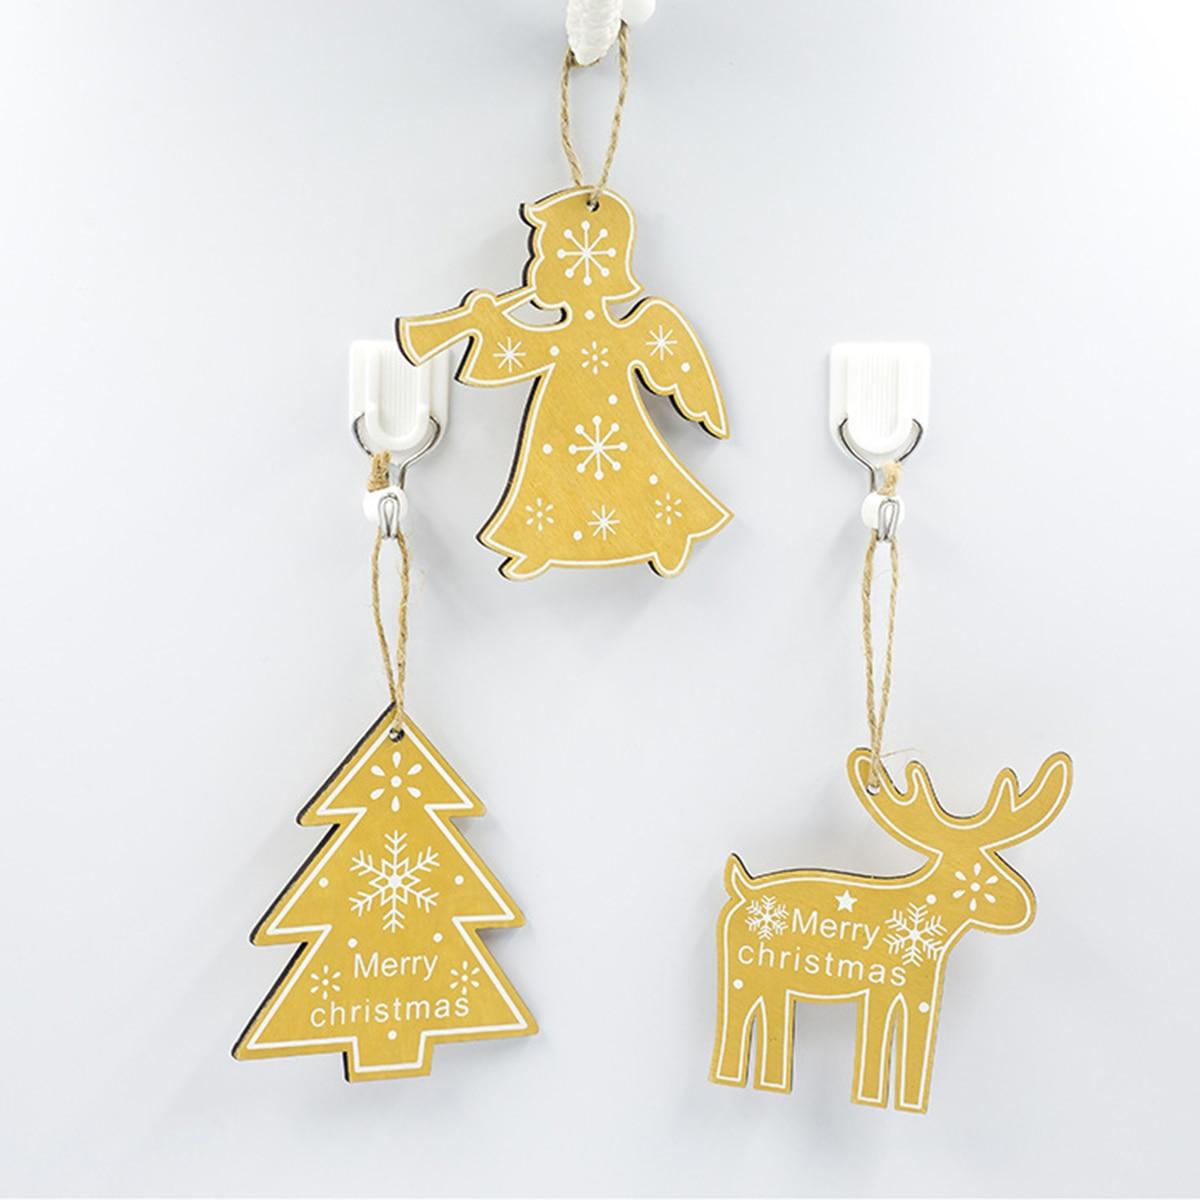 3pcs Merry Christmas Decorations DIY Unique Gift Xmas Tree + Angel + Elk Wooden Hanging Ornament Hanging Decor 2019